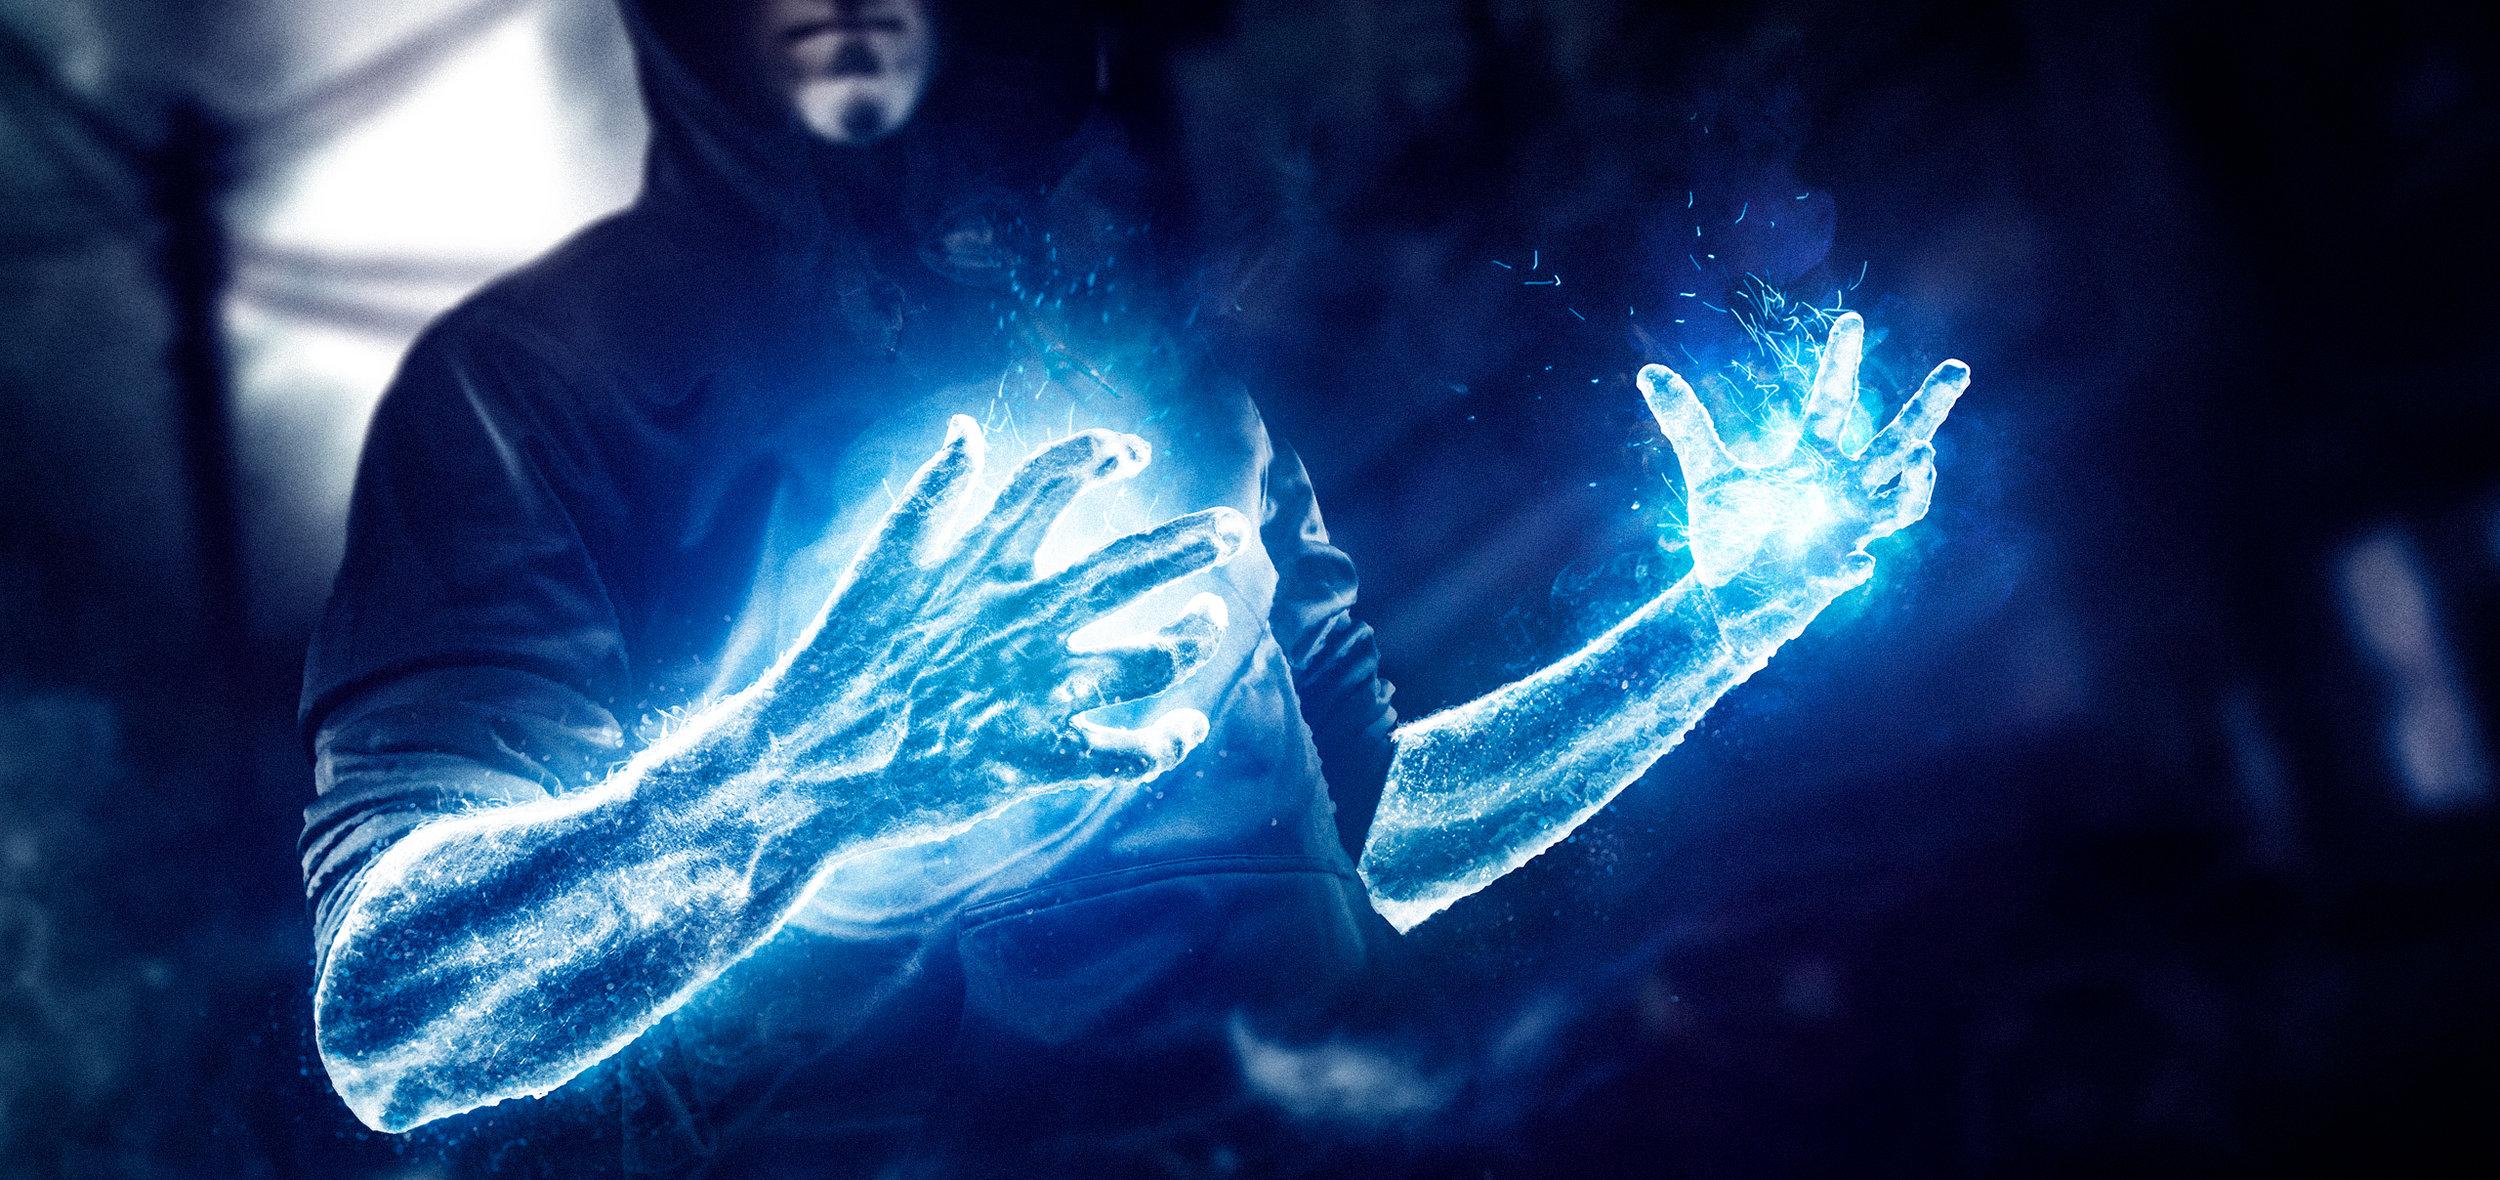 blue_sparks.jpg